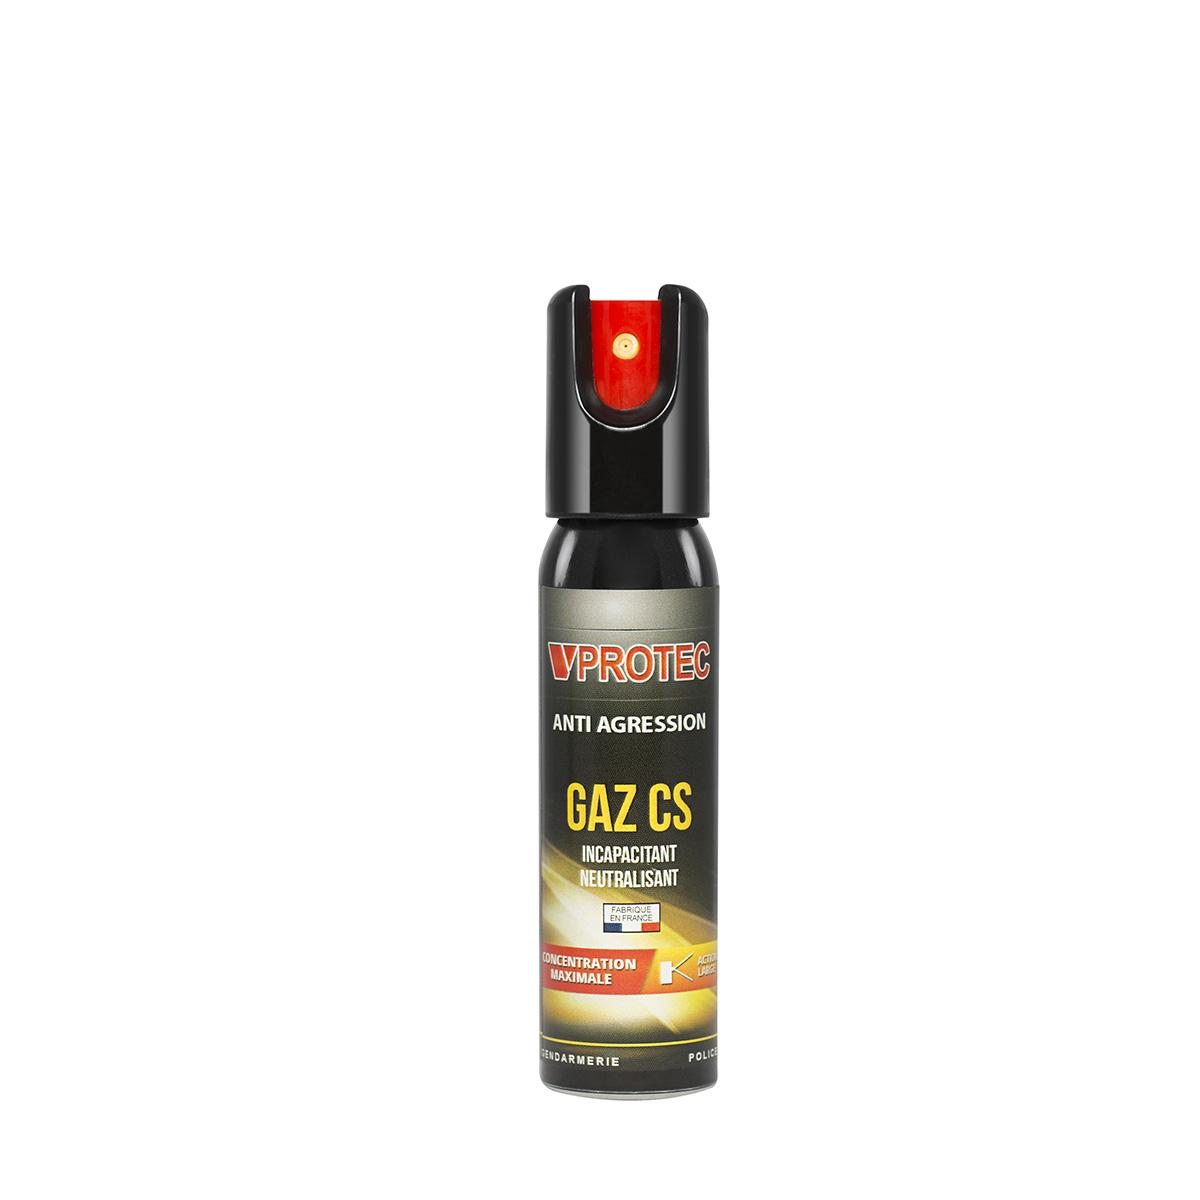 Lacrymogène gaz cs 25ml IMPACT VPROTEC